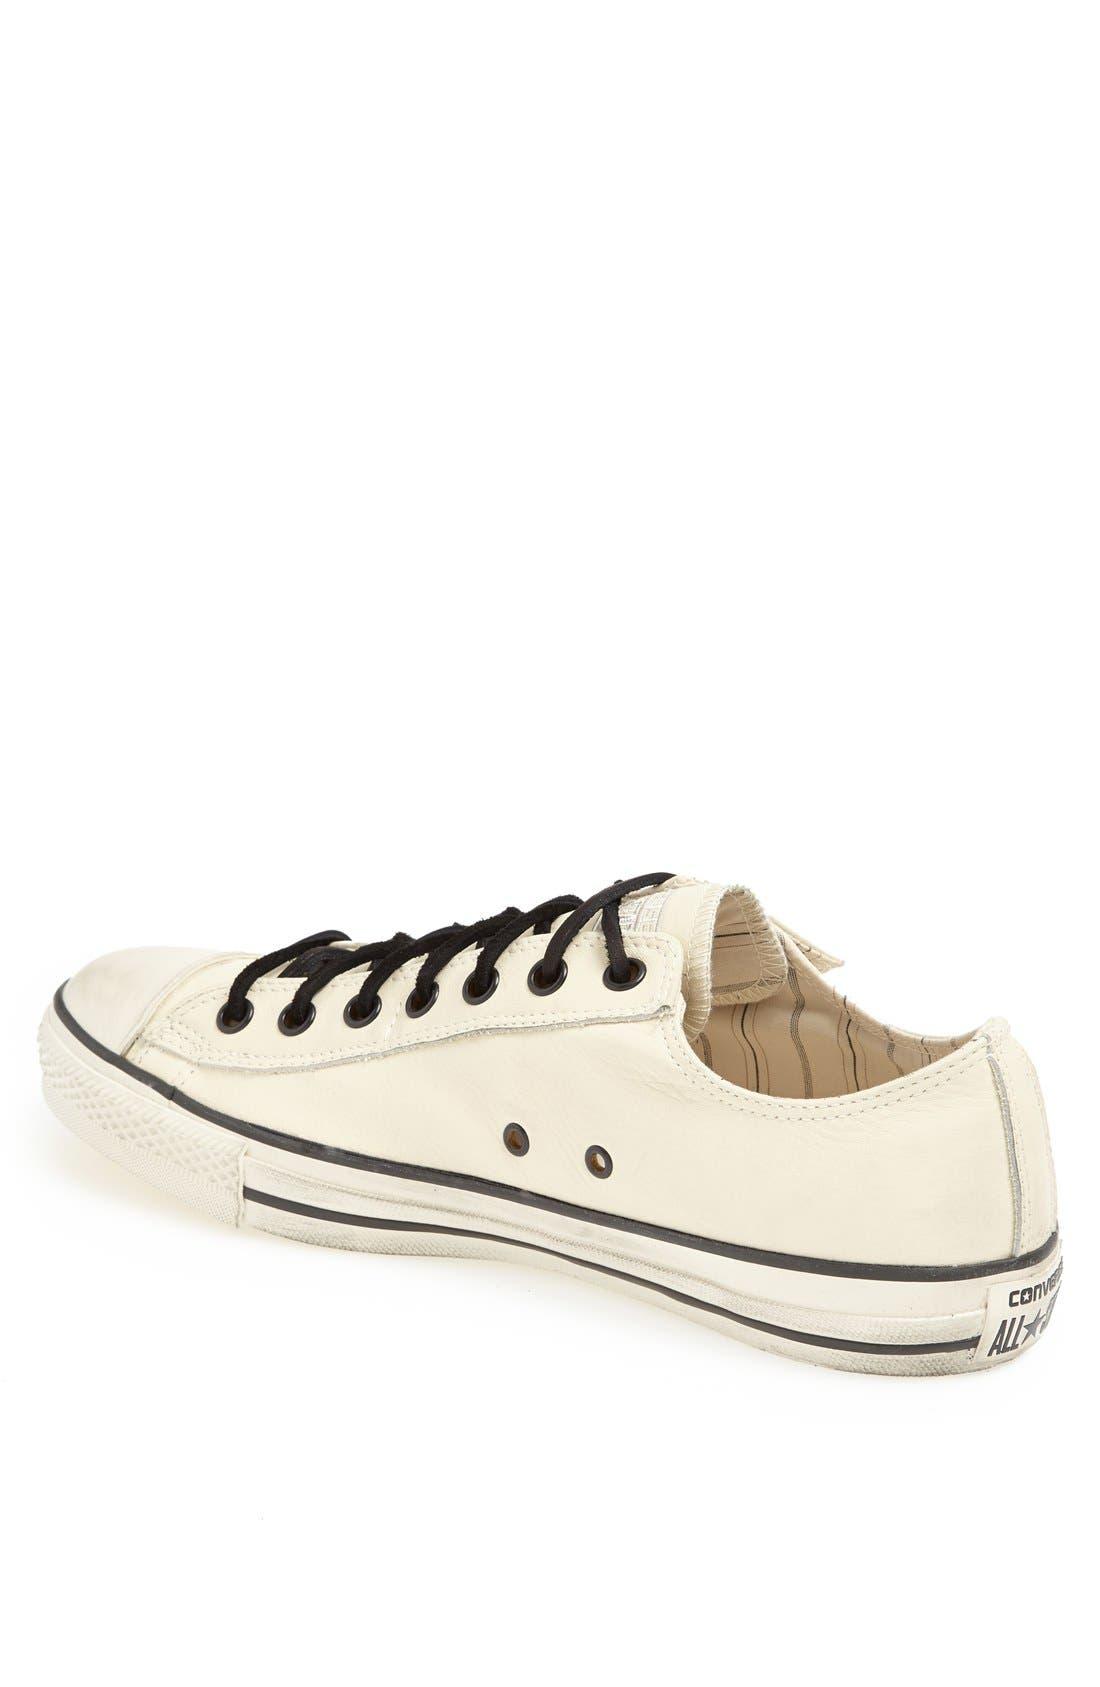 Alternate Image 2  - Converse by John Varvatos Chuck Taylor® All Star® Sneaker